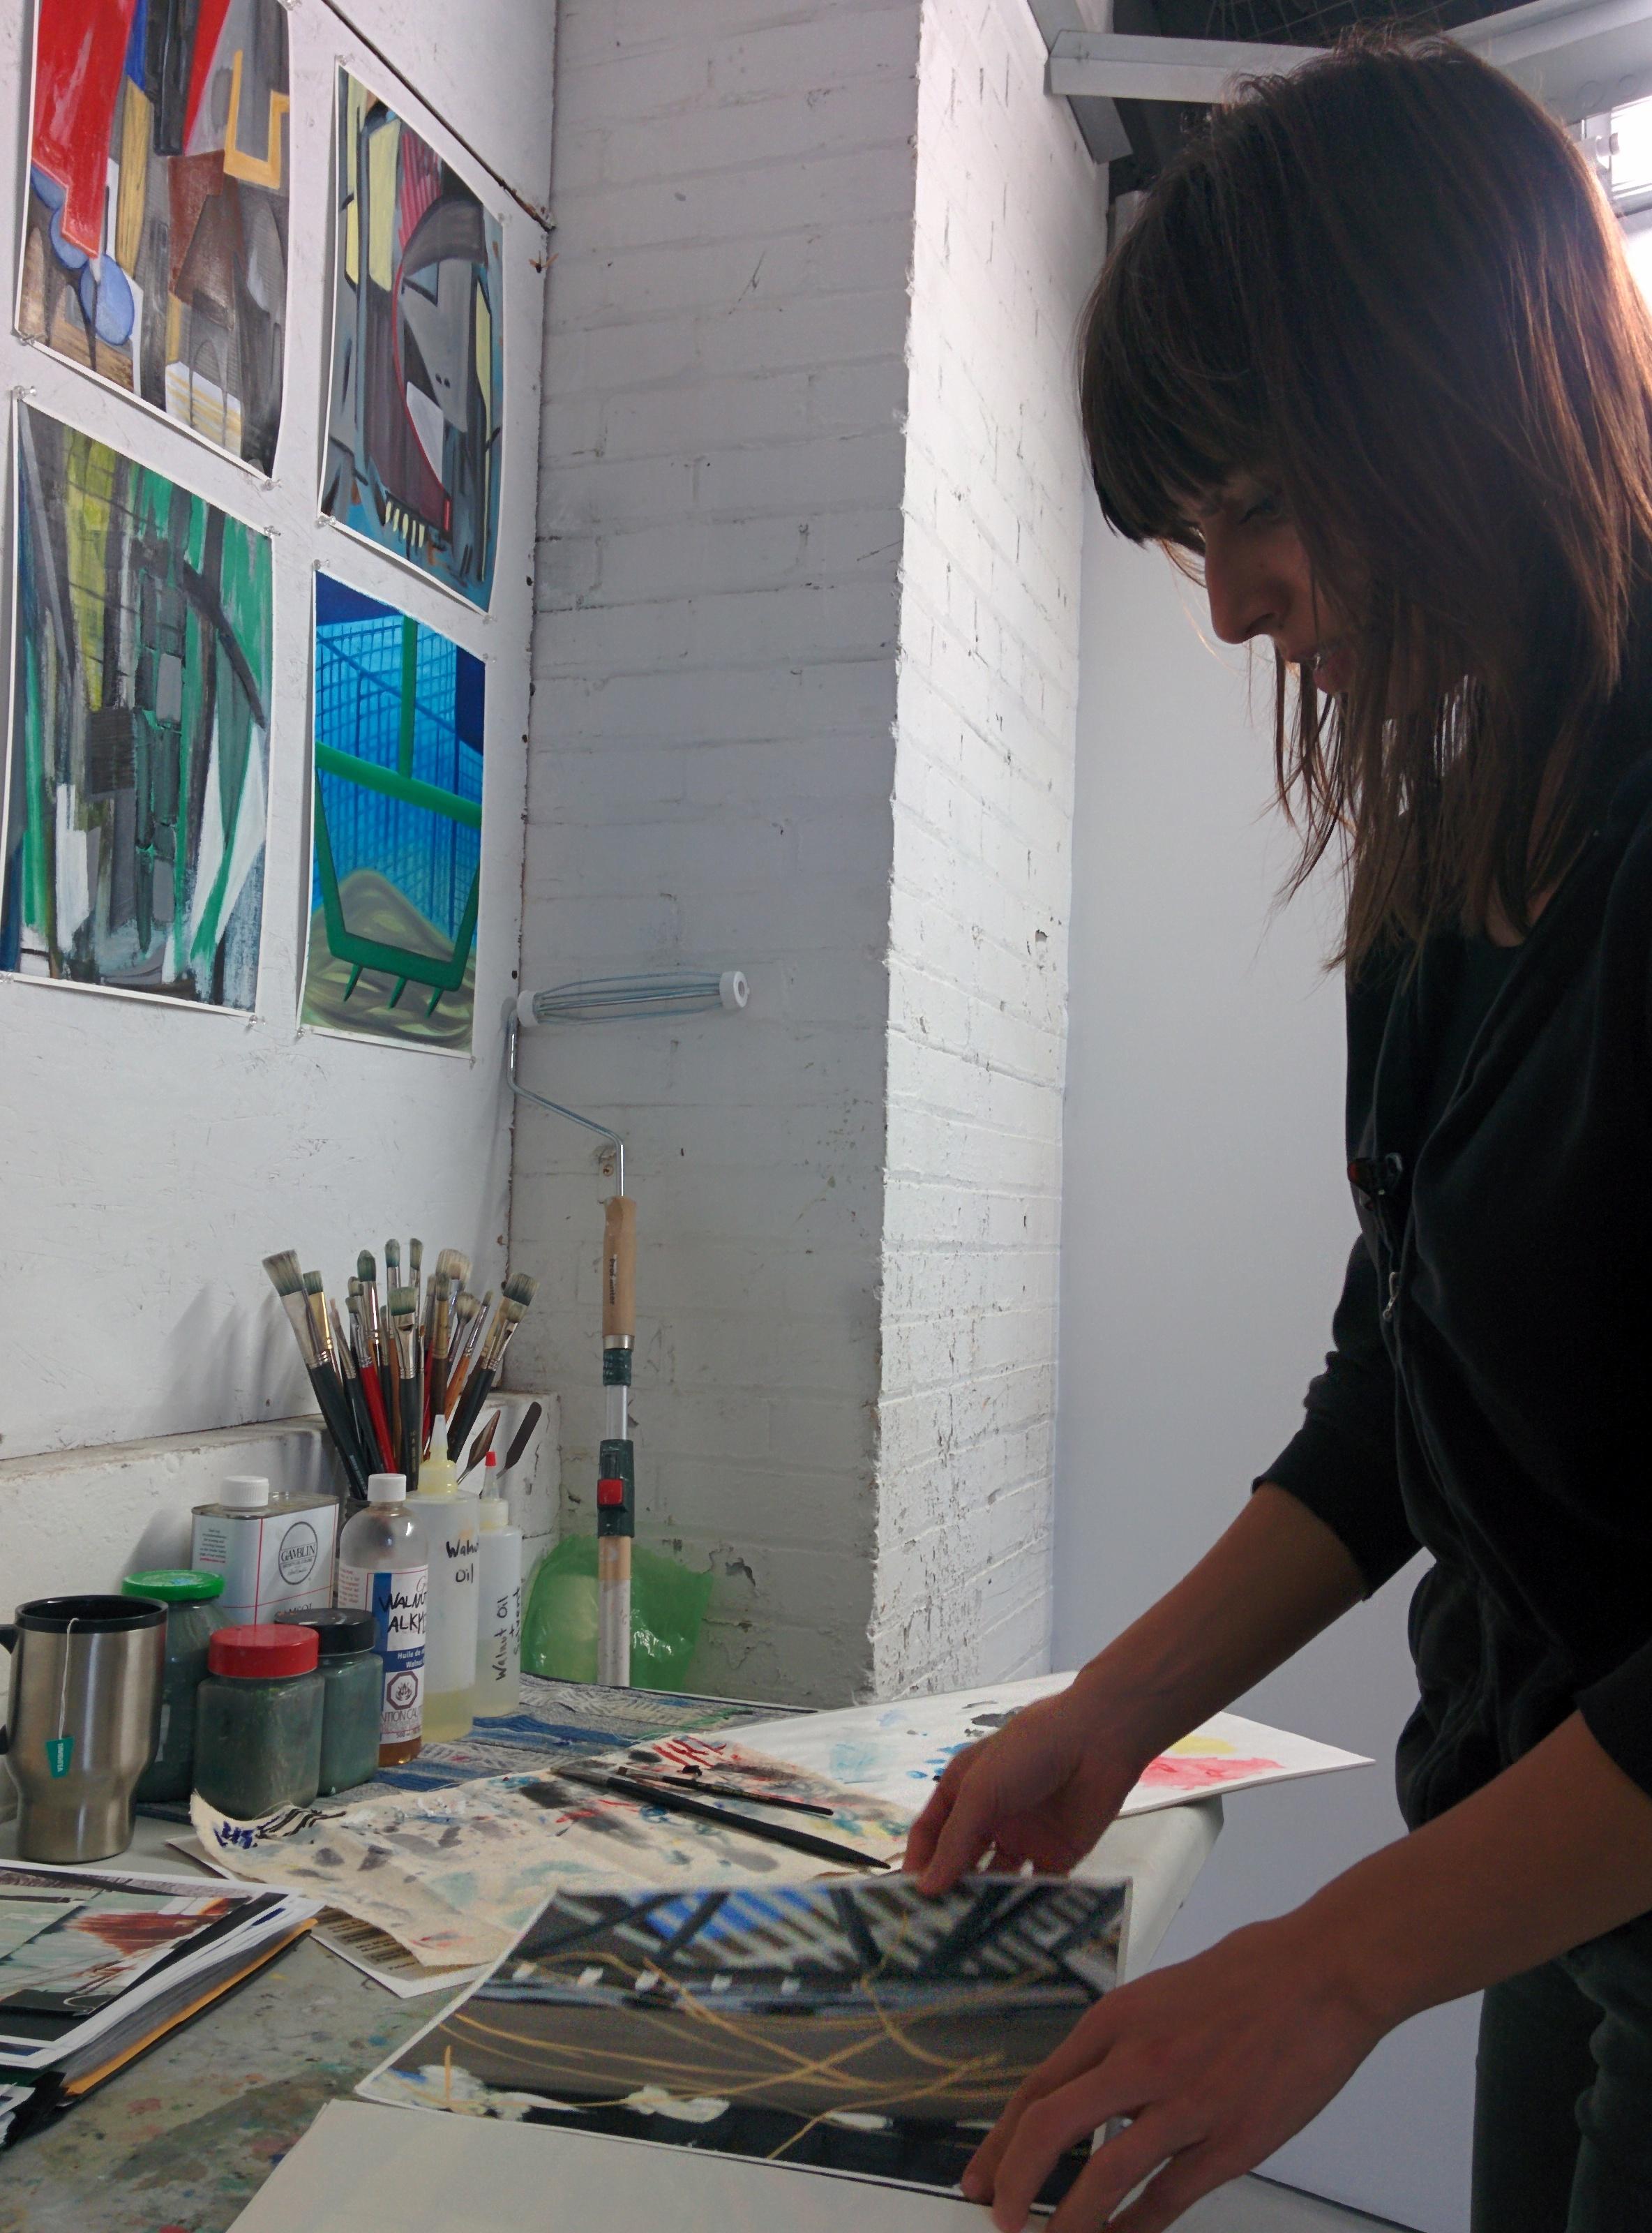 Studio Visit with Milena Roglic